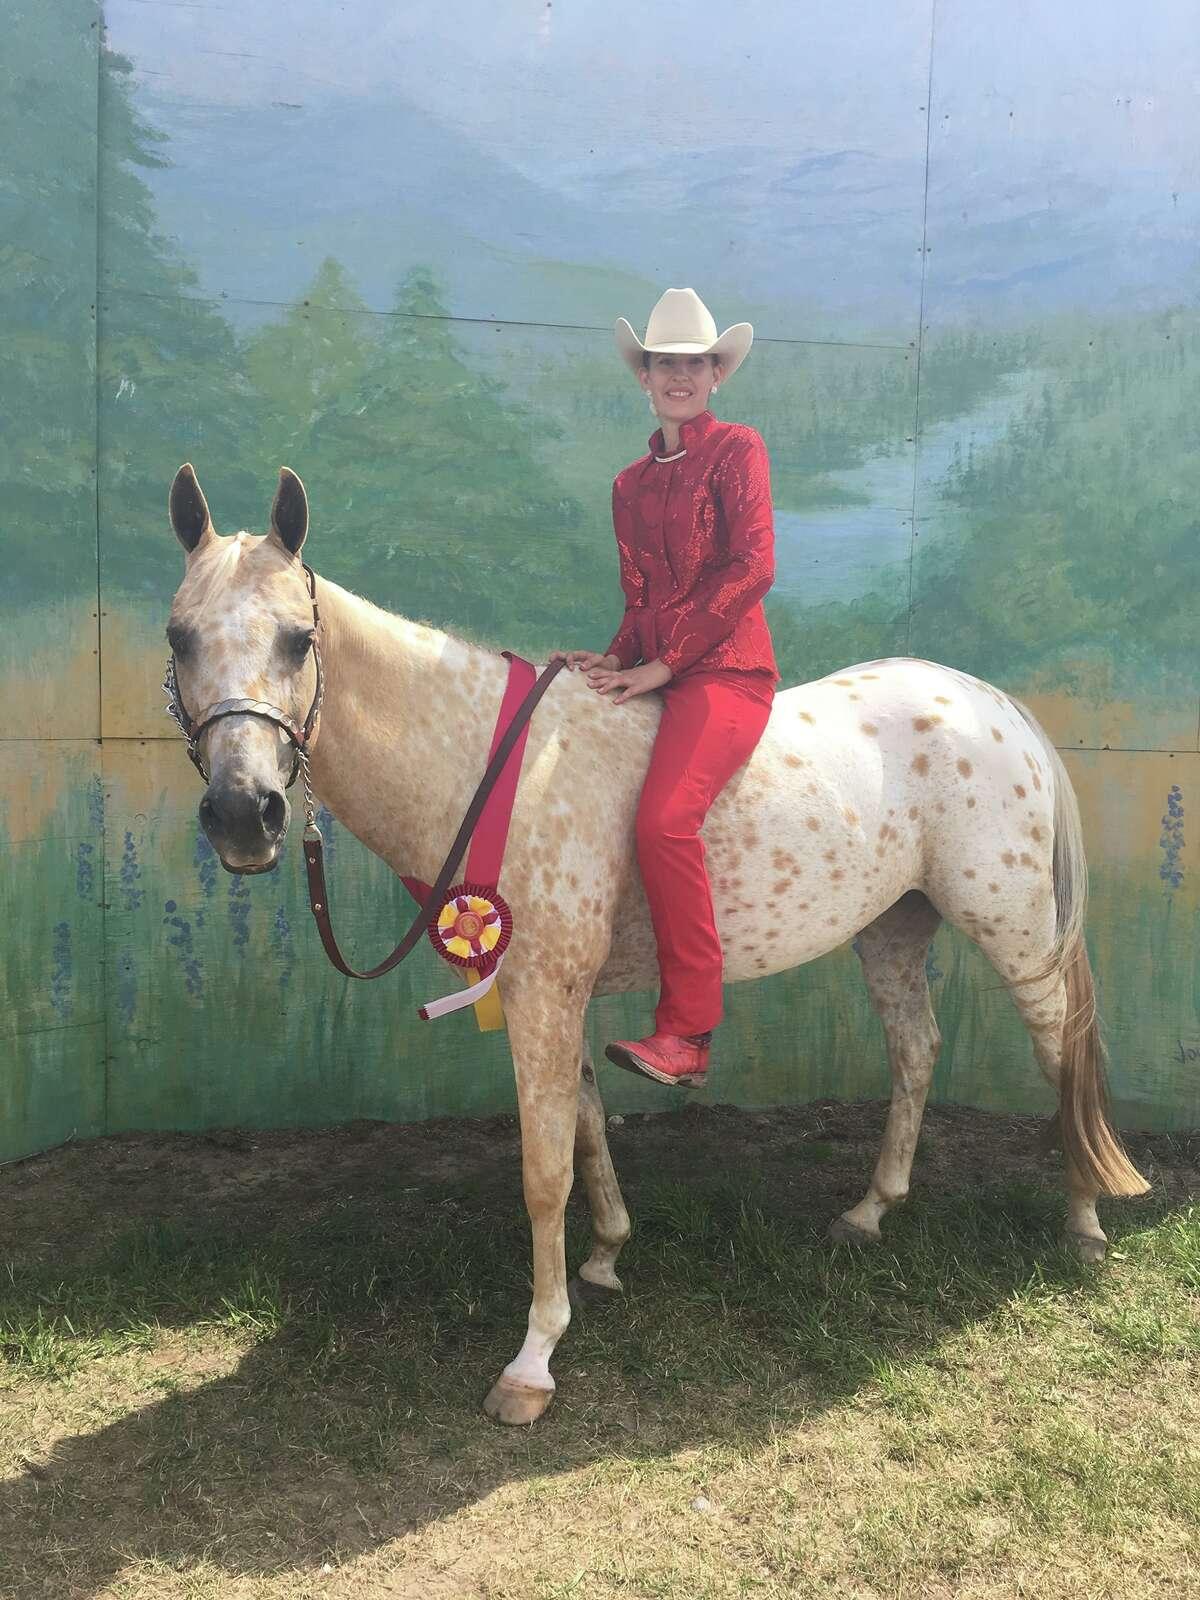 Samantha Veltema - Hats to Hooves. Samantha shows a pony.